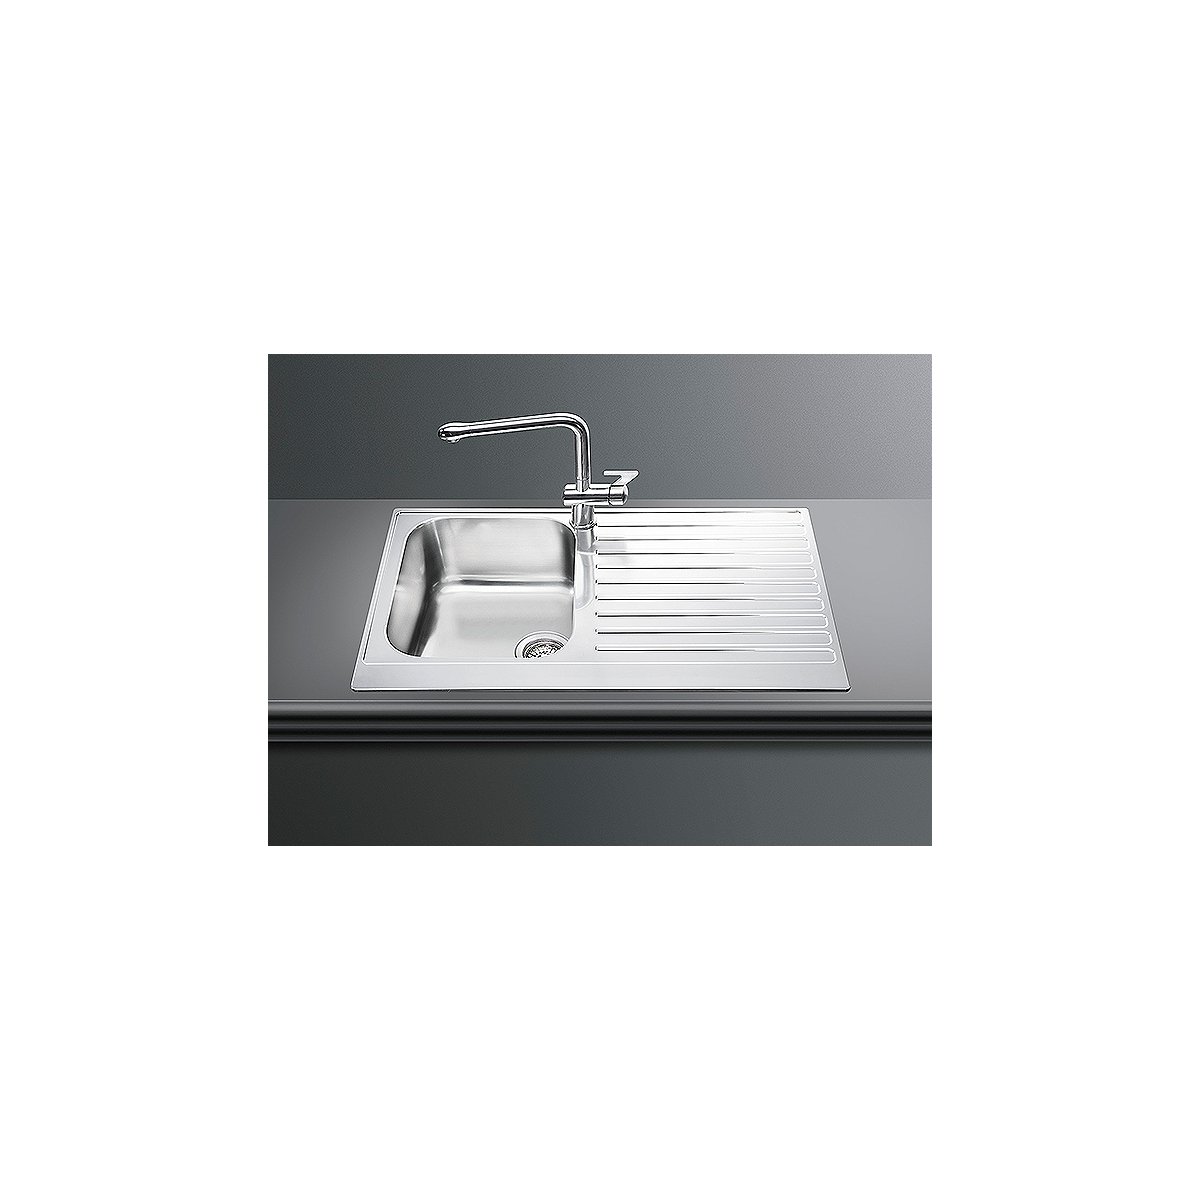 smeg piano lpd861d s eviers encastrer direct evier. Black Bedroom Furniture Sets. Home Design Ideas